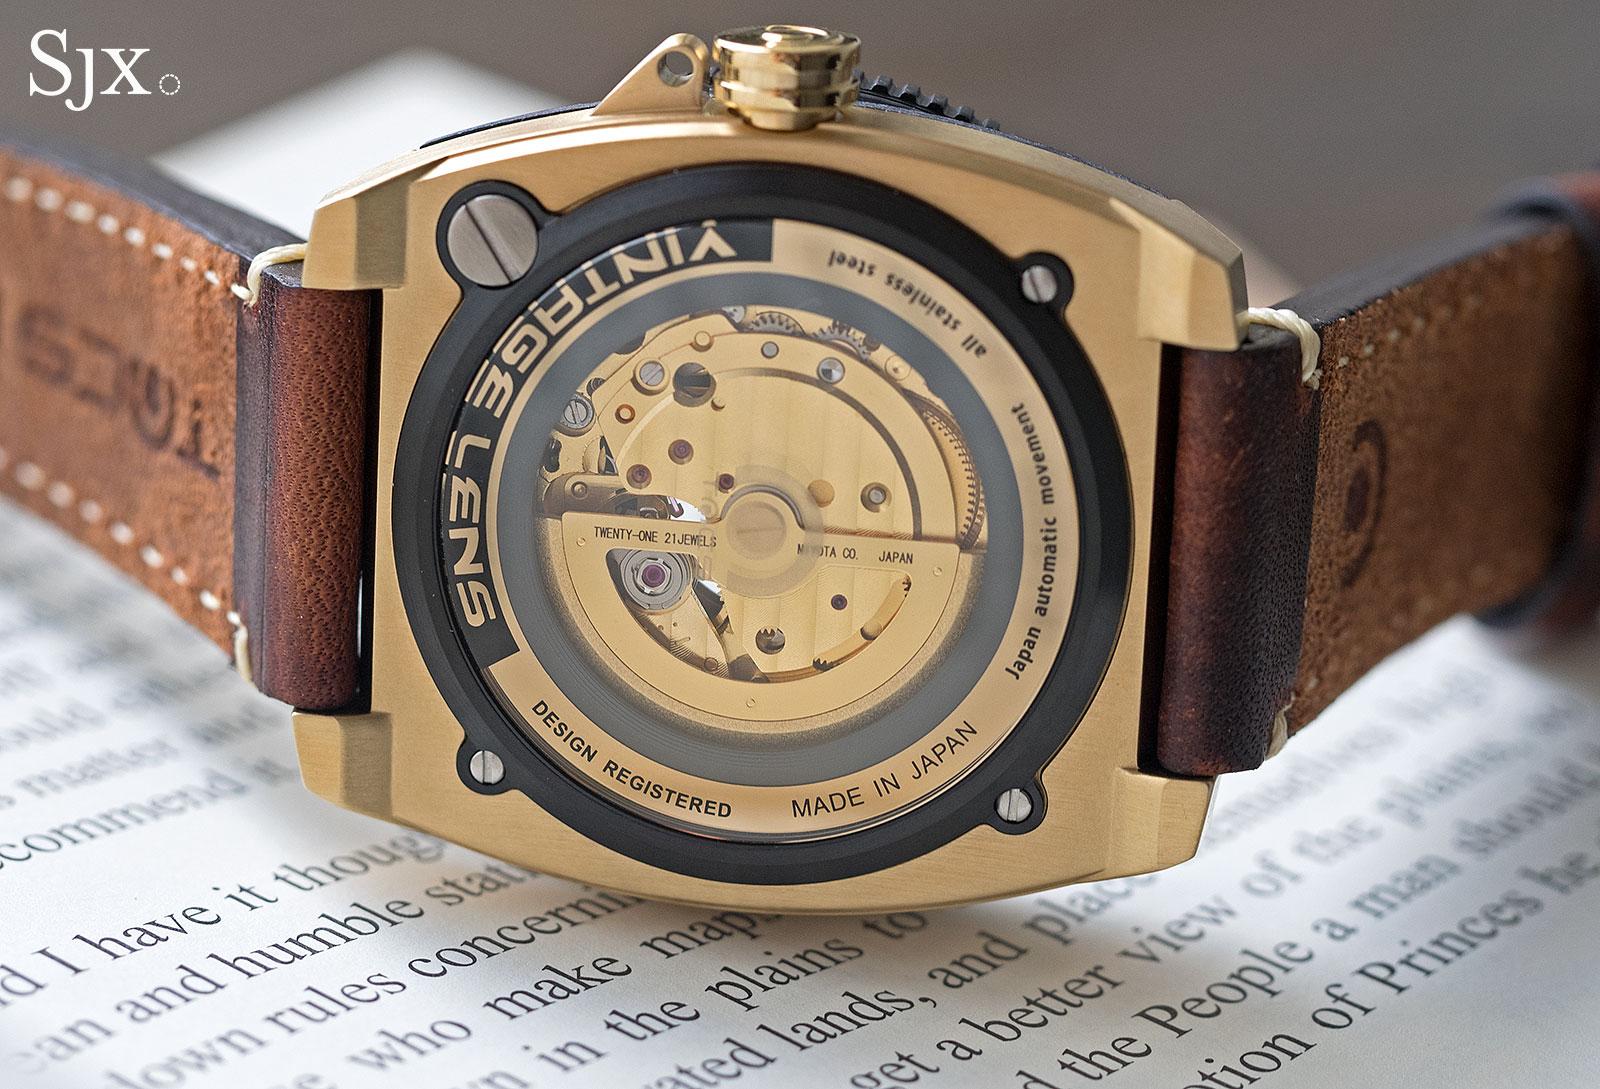 TACS Vintage Lens Automatic watch 4